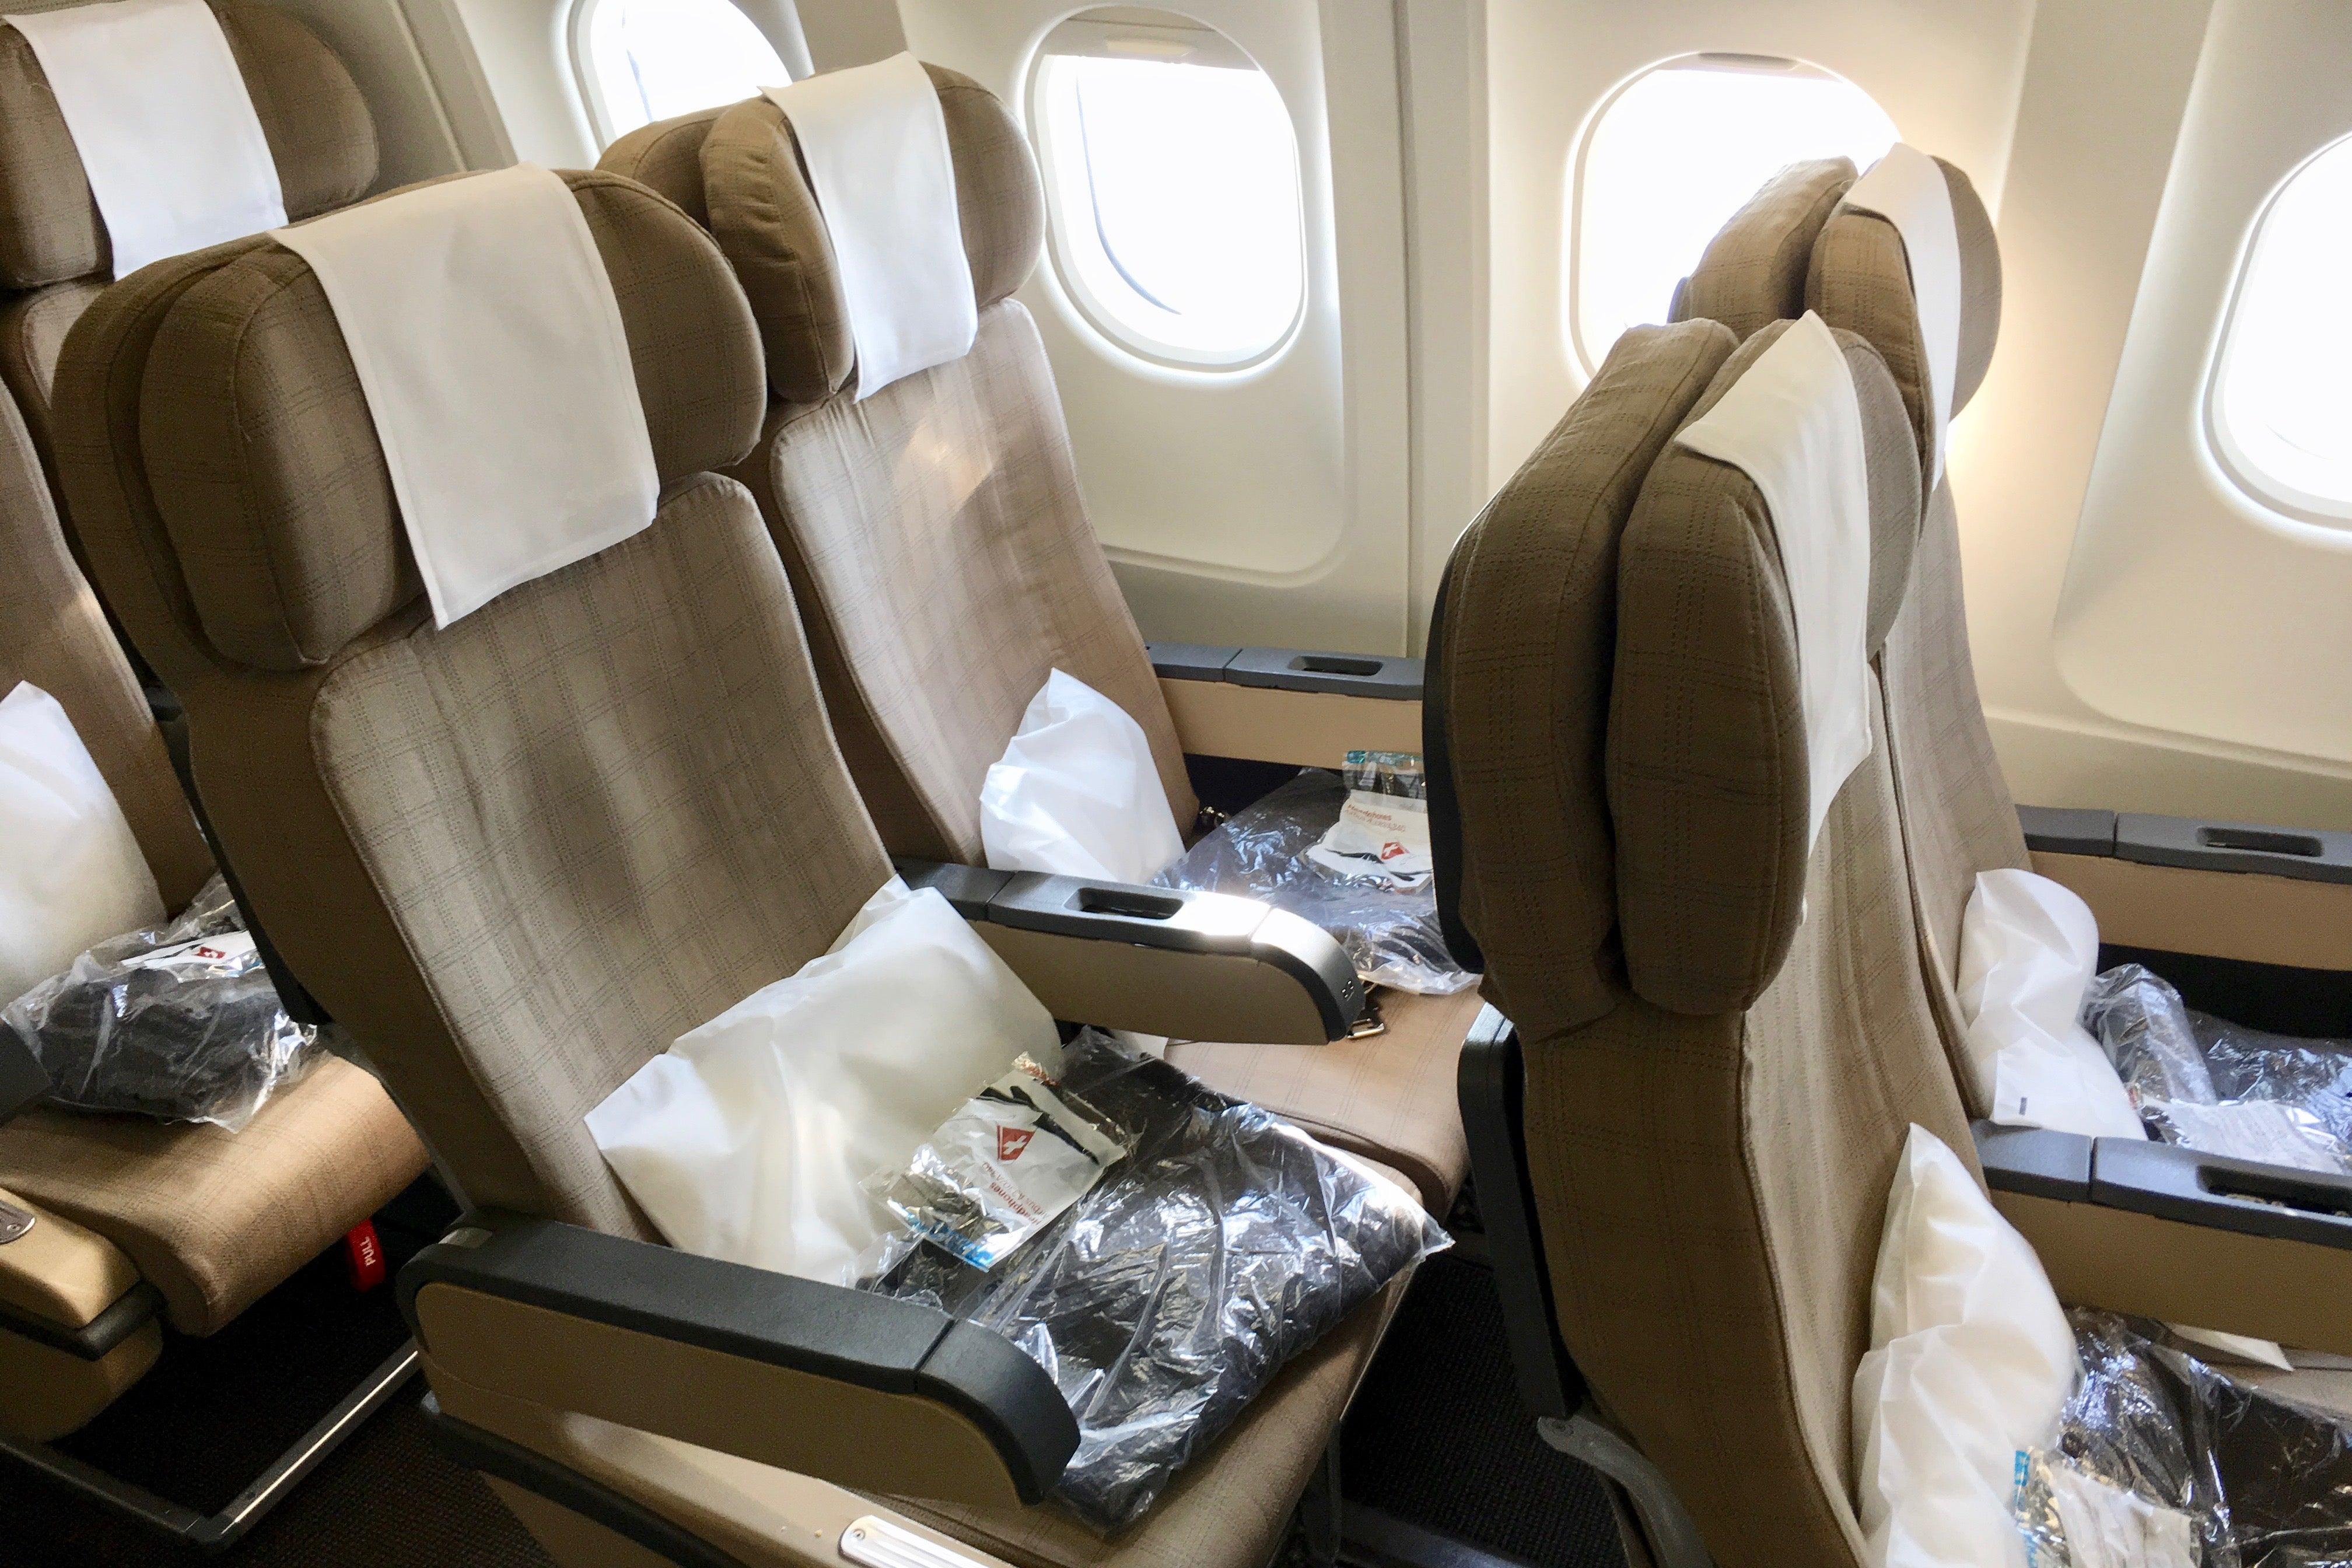 Flight Review: Swiss (A340-300) Economy, Zurich to Boston